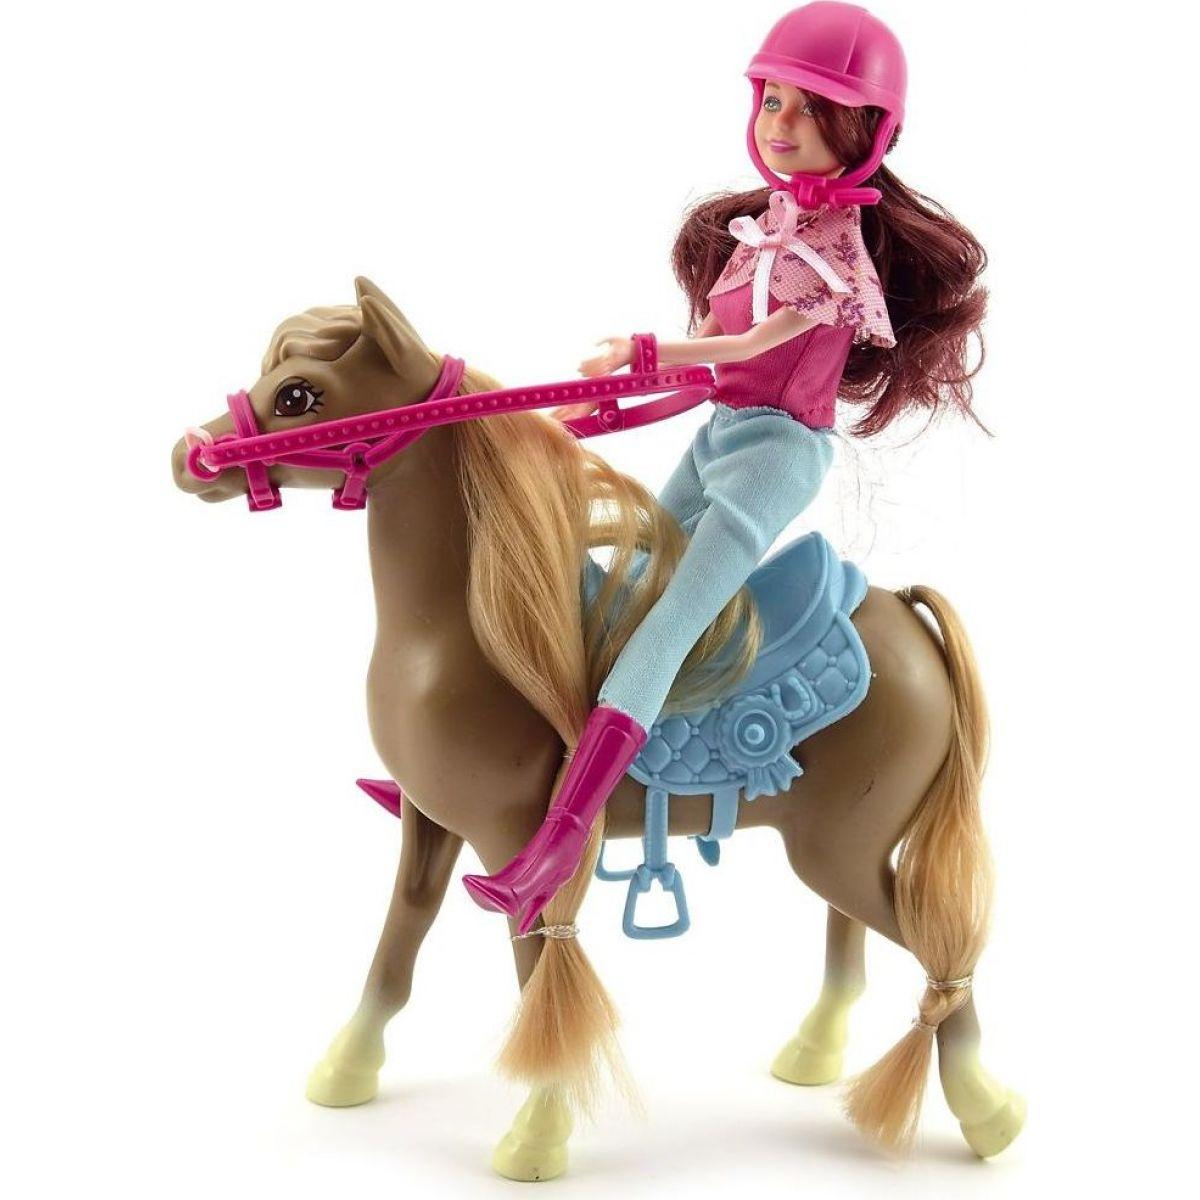 Kôň s bábikou žokejkou